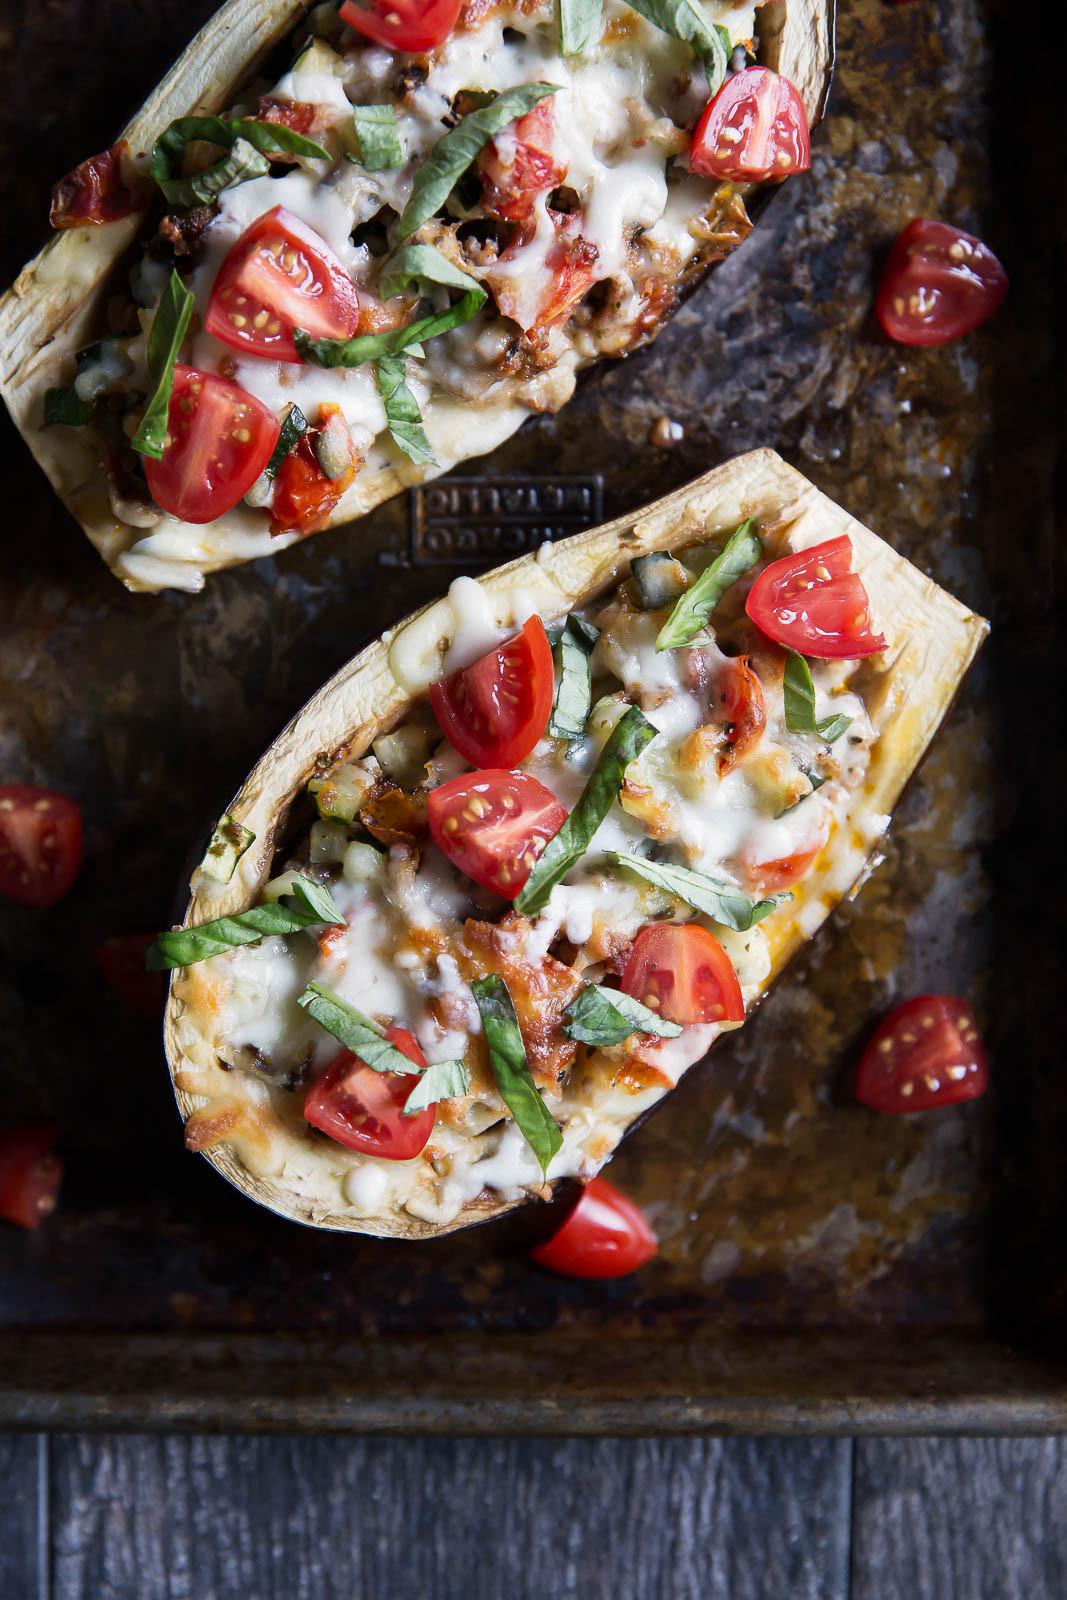 Healthy Eggplant Recipes  Julie's Stuffed Eggplant Boats